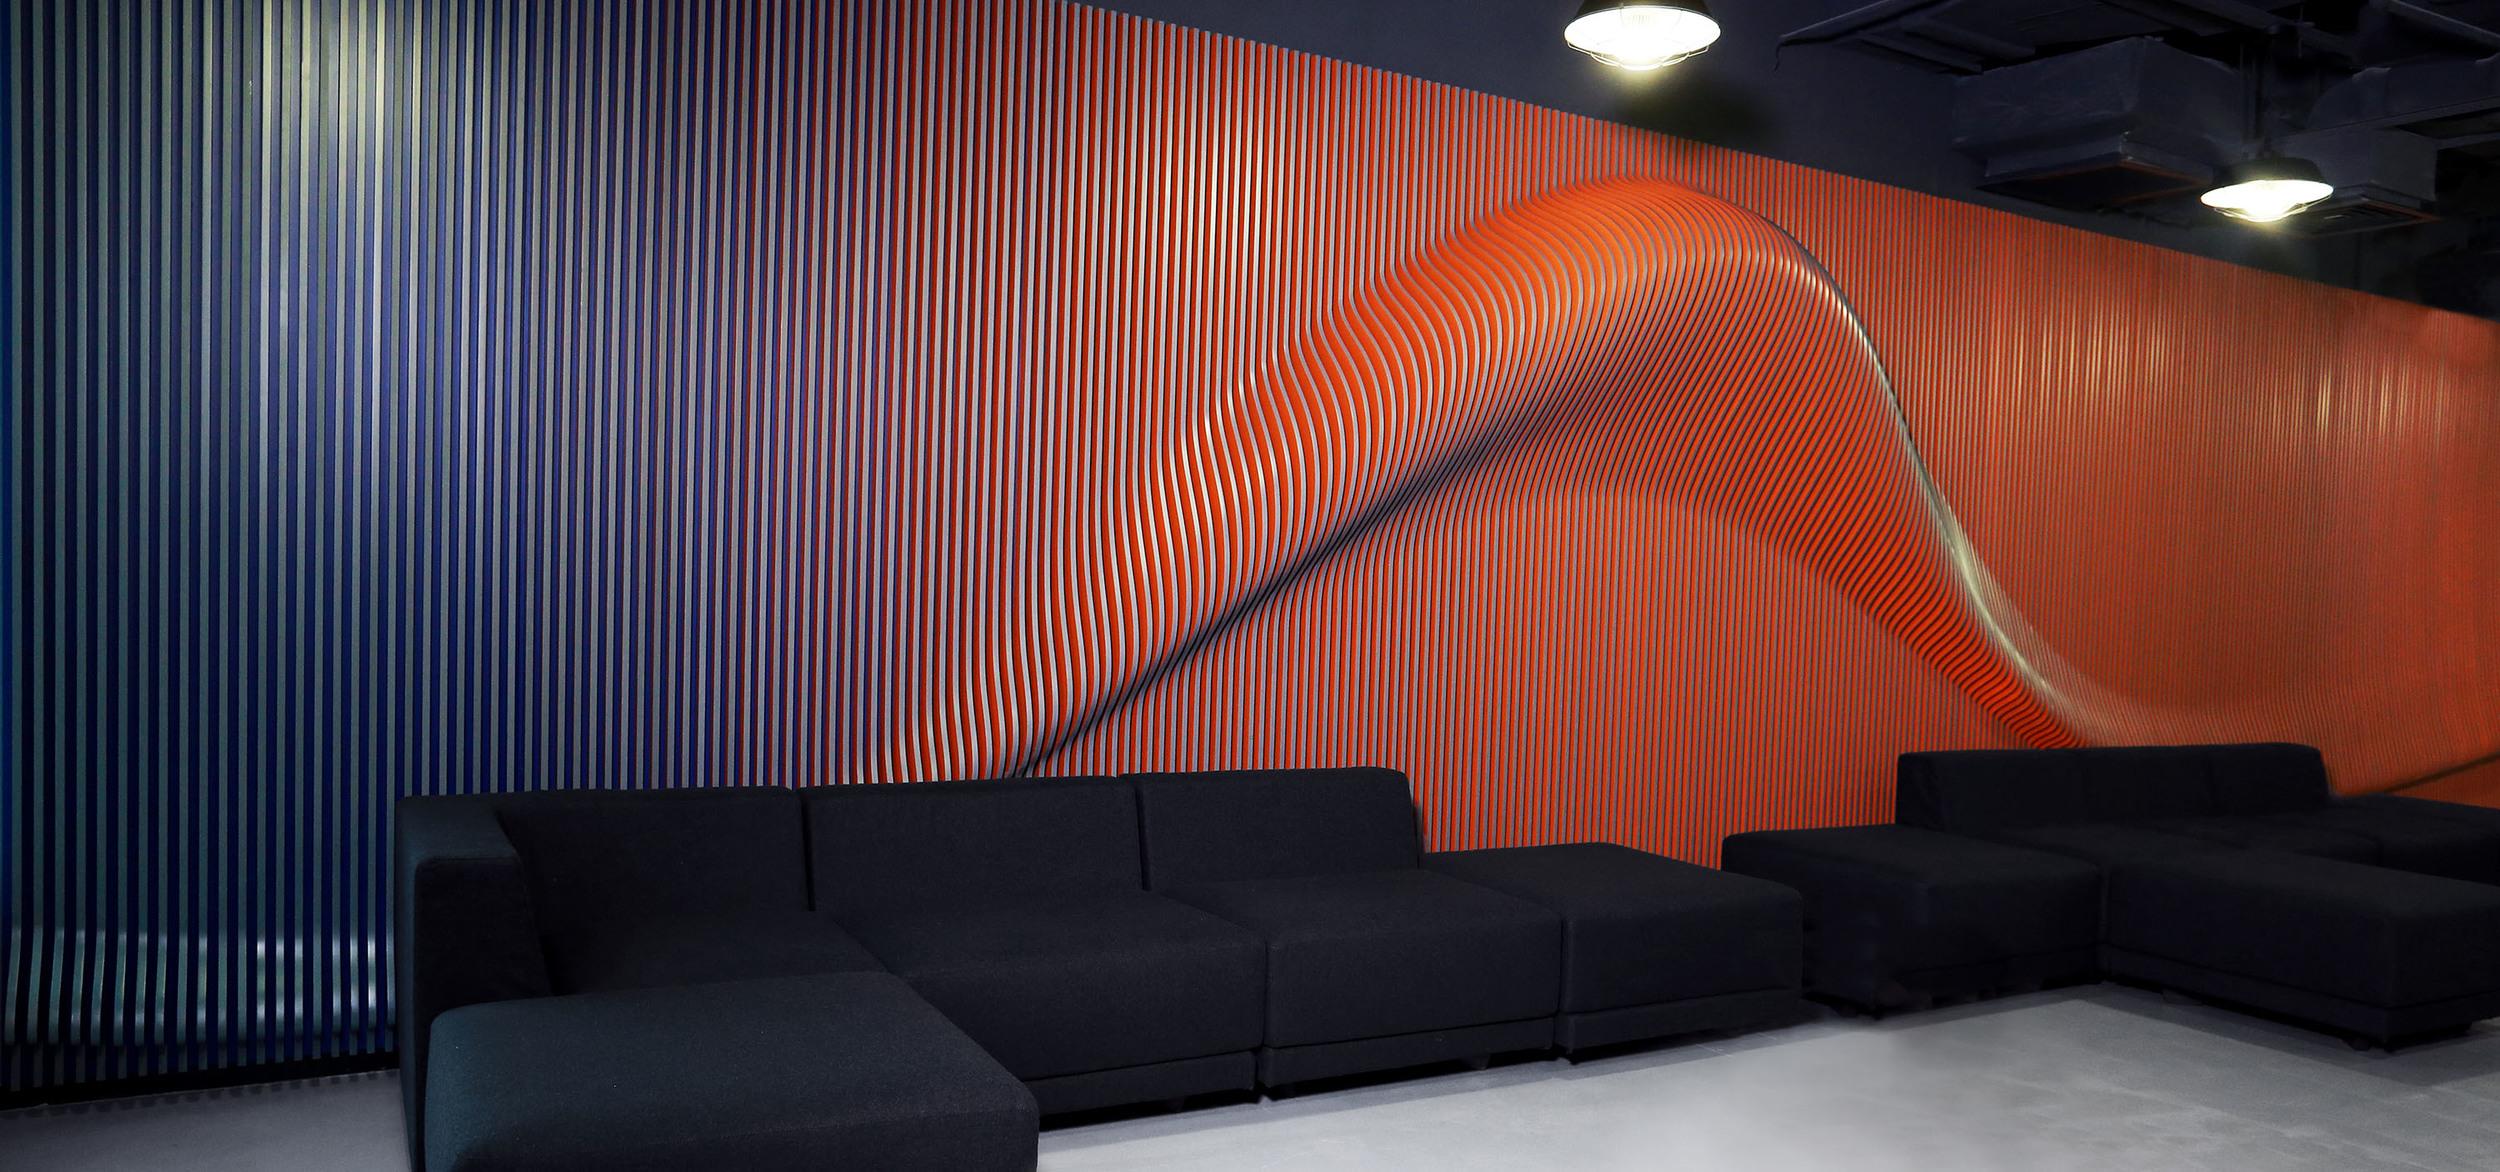 NIKE Beijing Brand Art Installation Lamella Piece